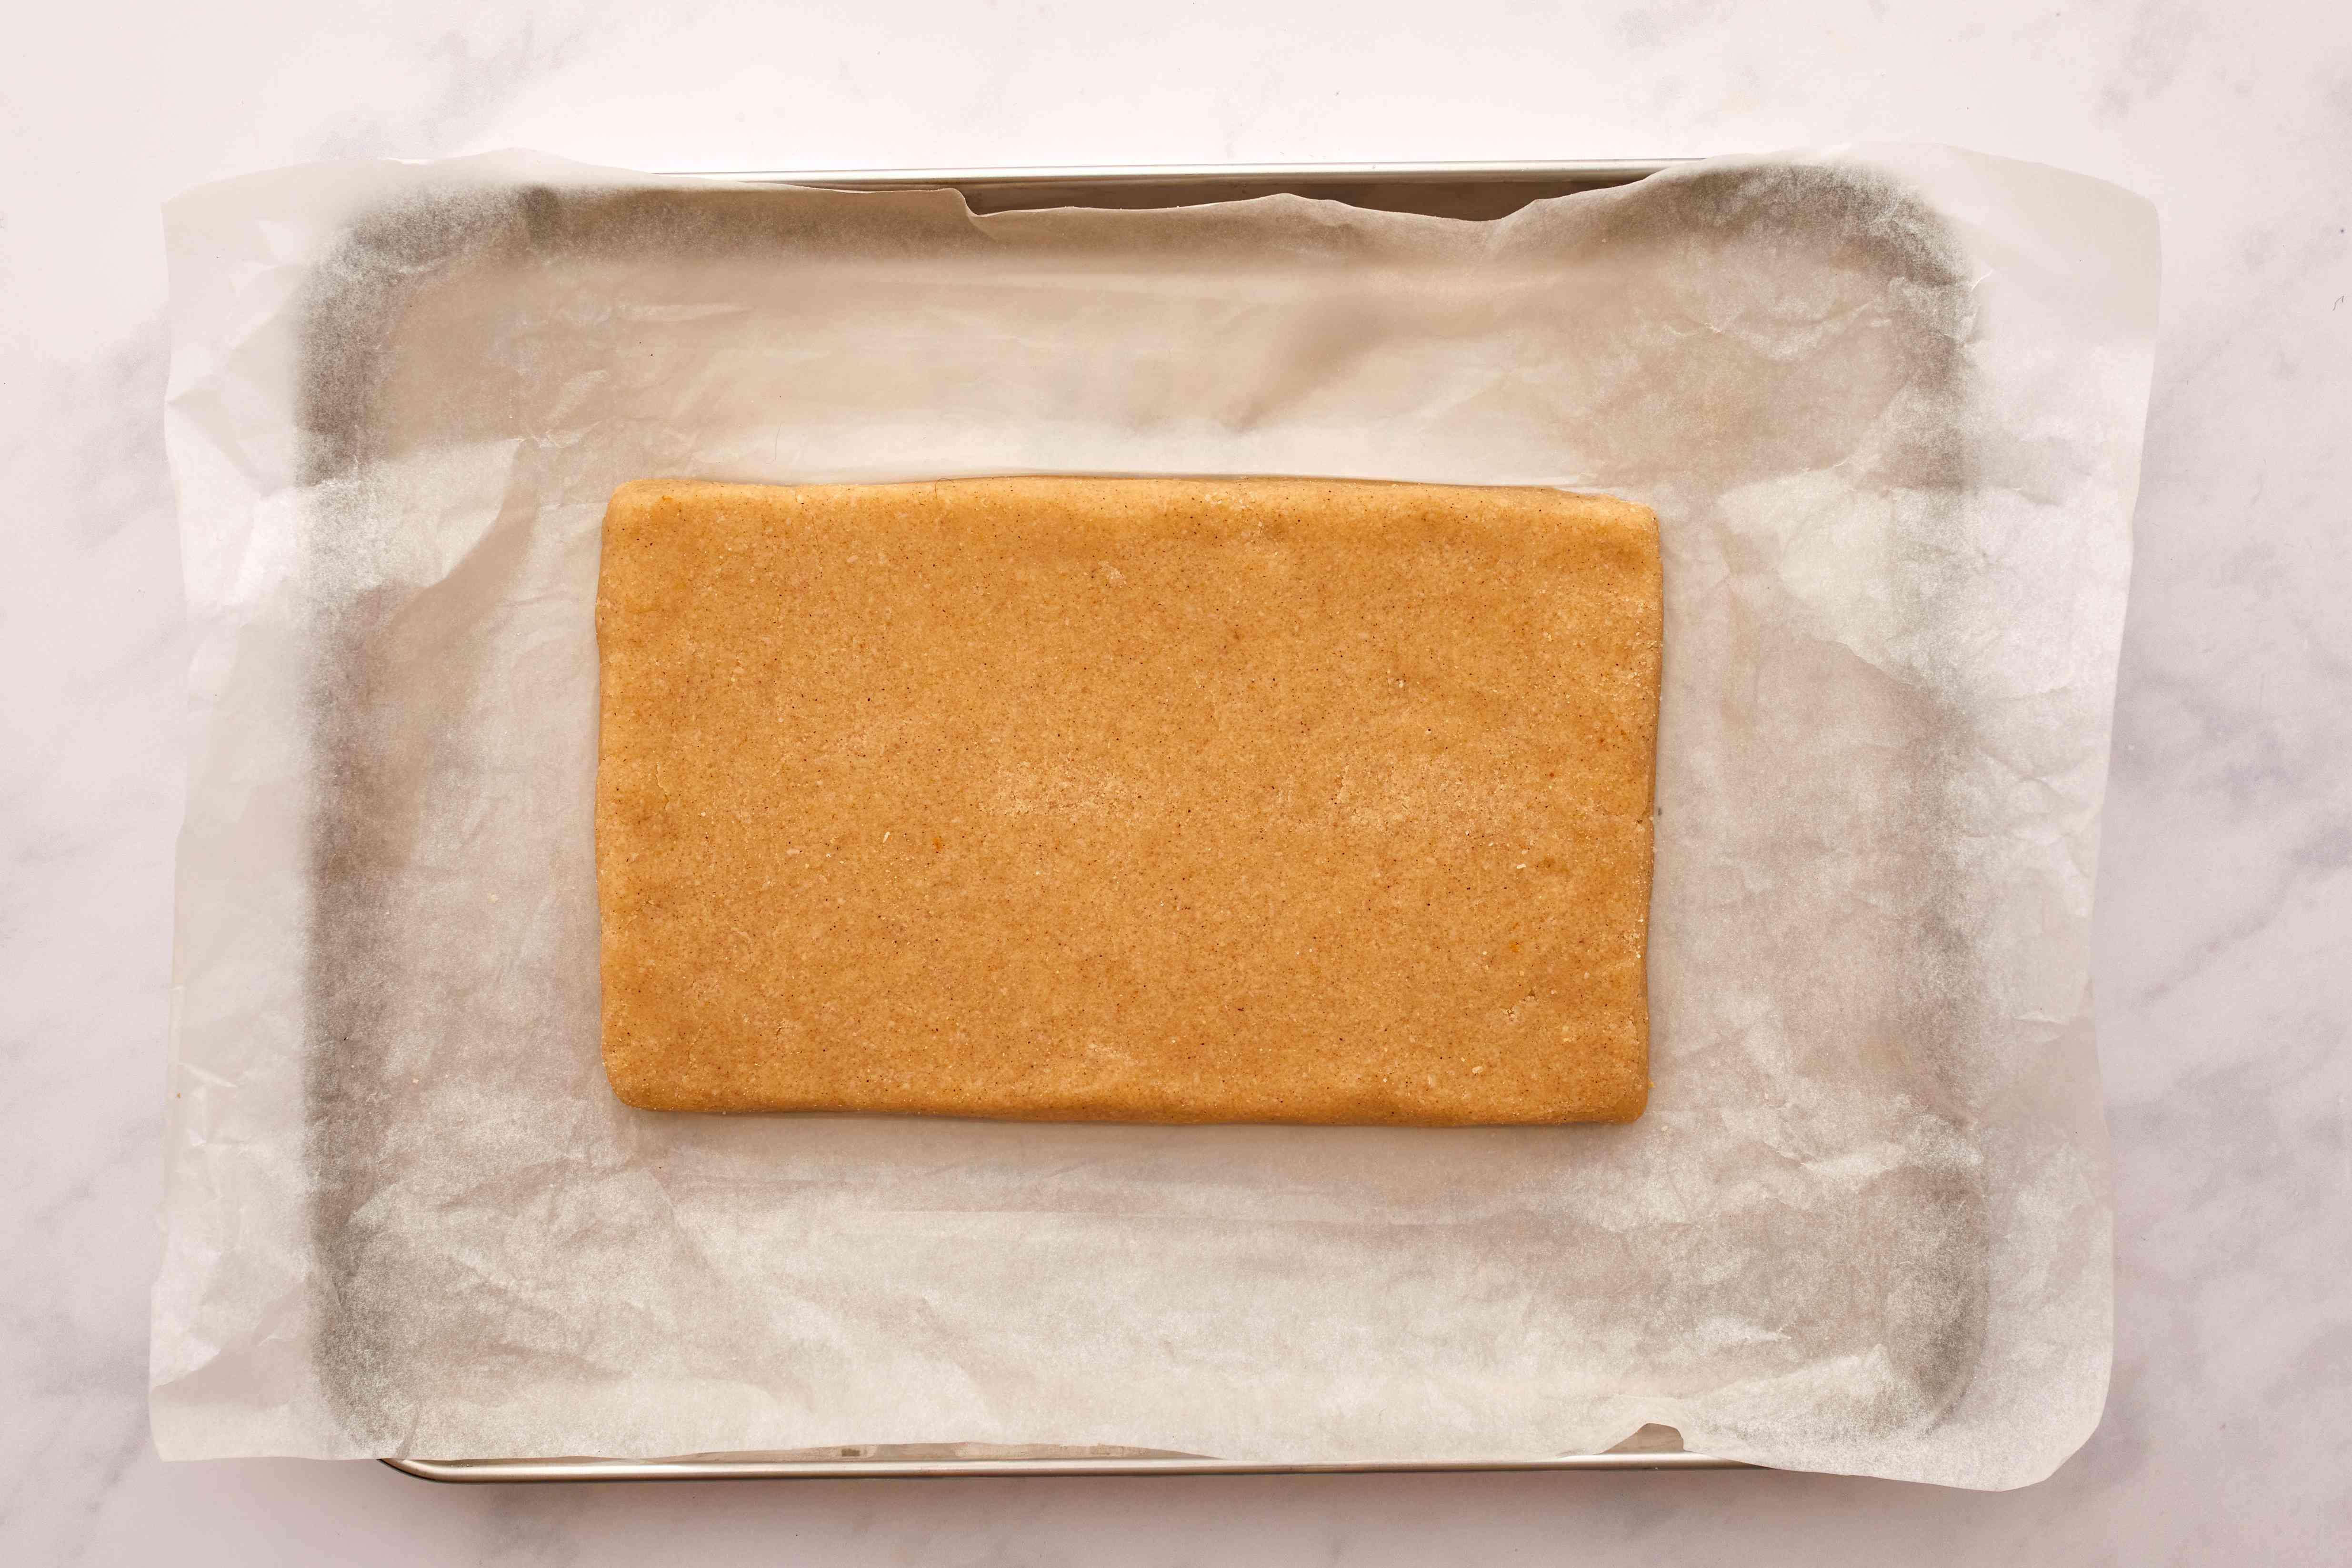 keto ladyfingers dough in rectangle on sheet pan ready to bake